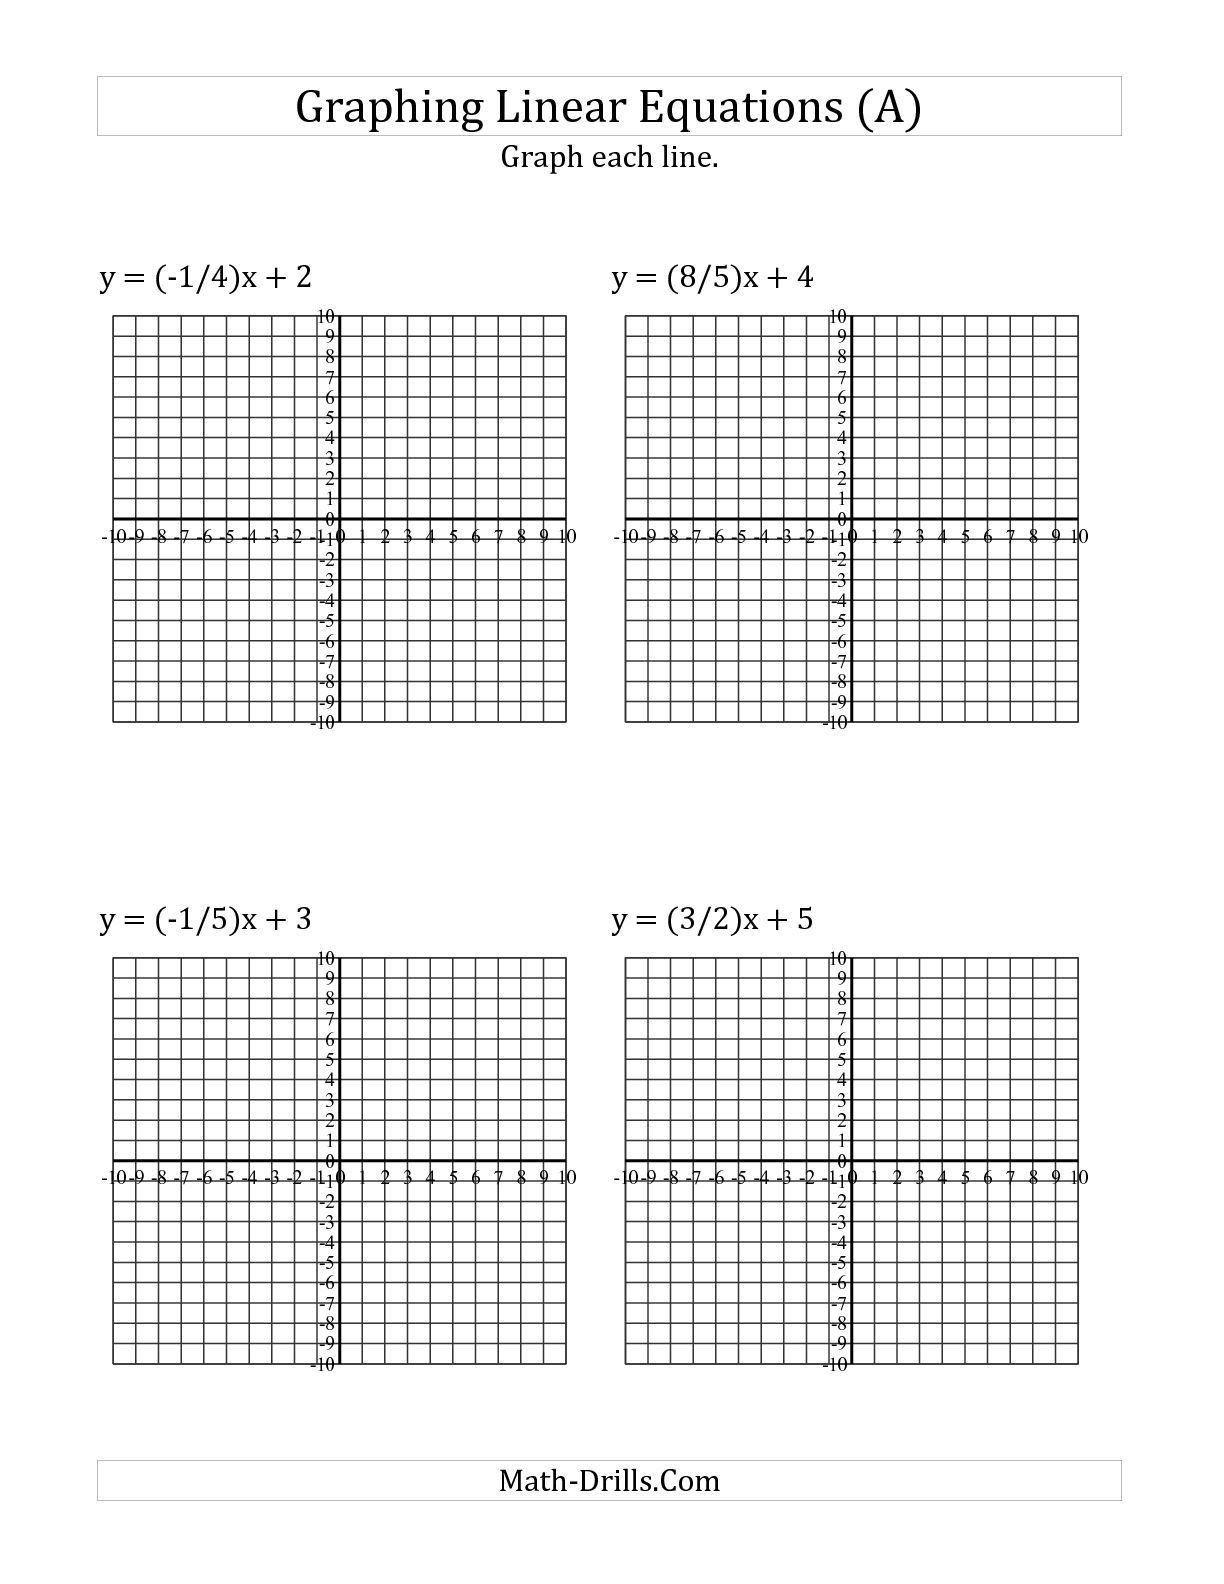 Graphing Linear Inequalities Worksheet Graphing Linear Equations Practice Worksheet the Graph A